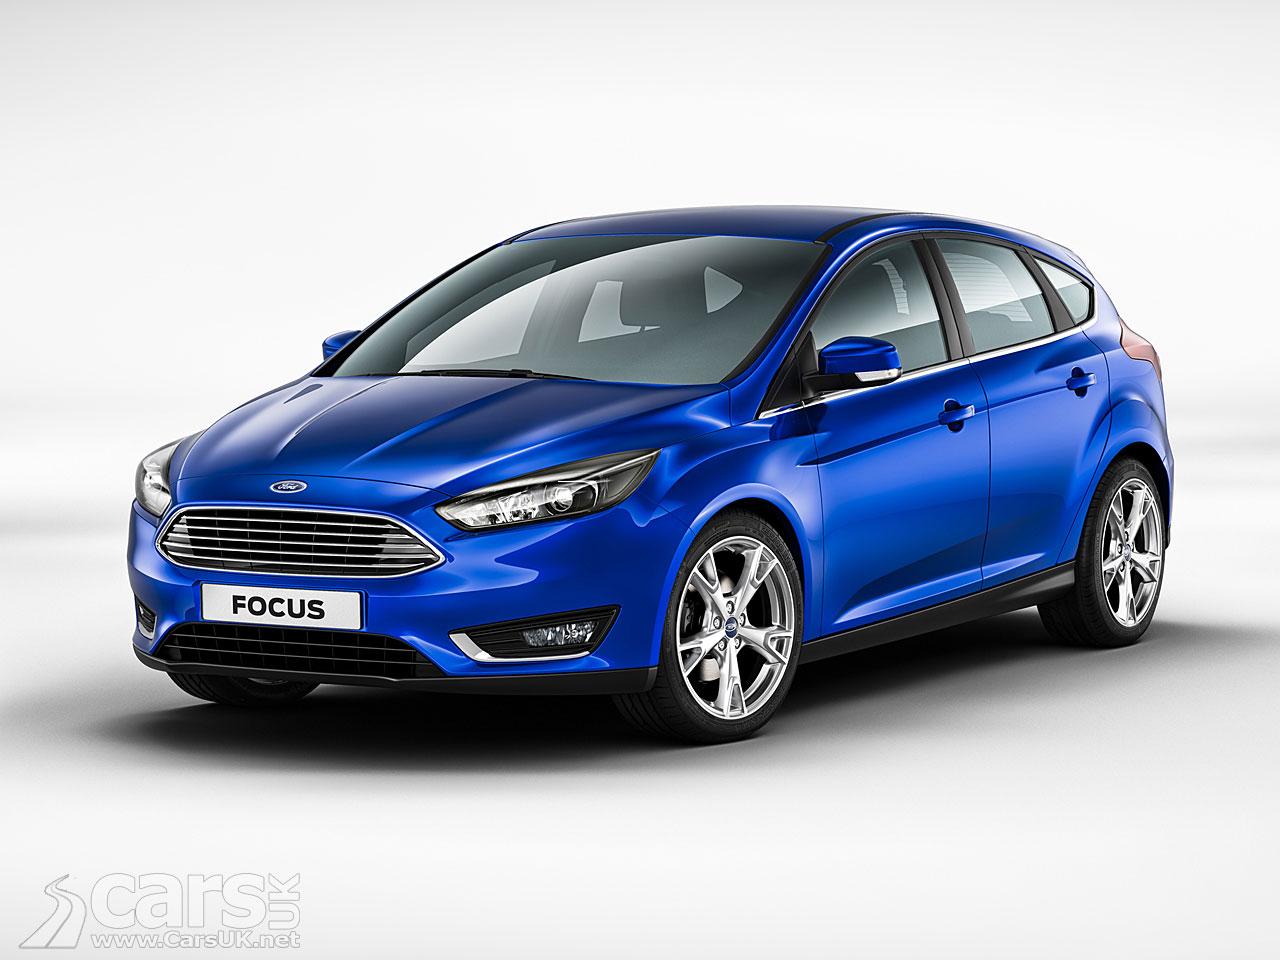 2014 ford focus 21 ford focus 21 - Ford Focus 2014